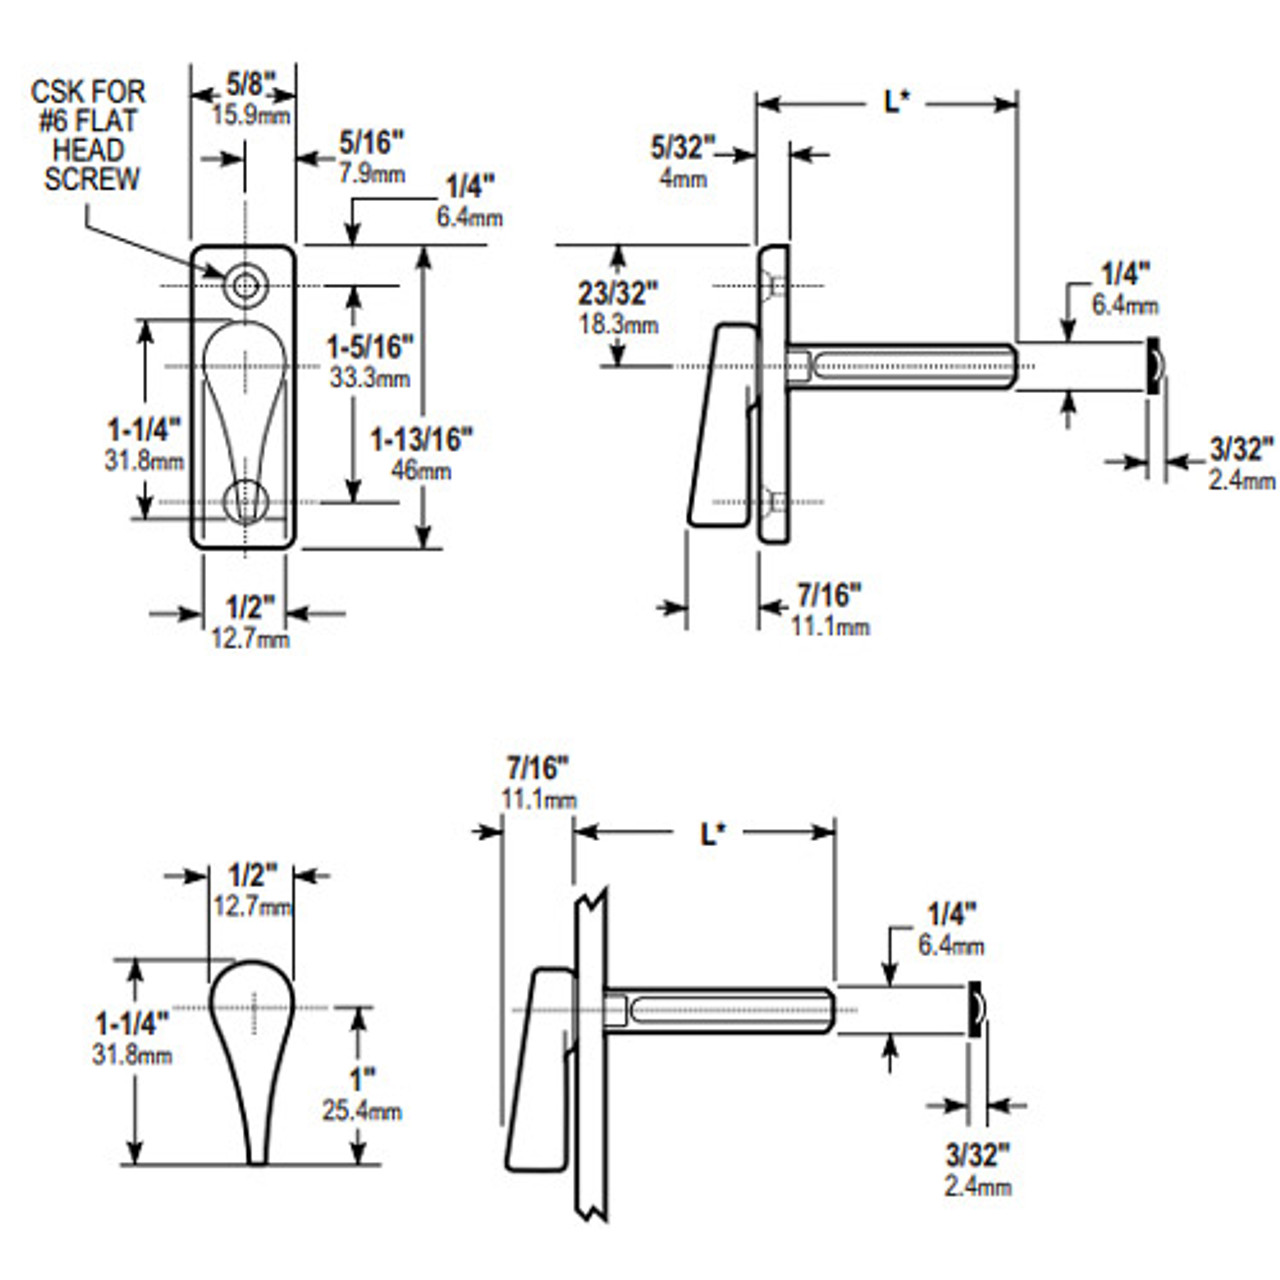 1000-21-14-121 Adams Rite 1000 Series Turns Dimensional View